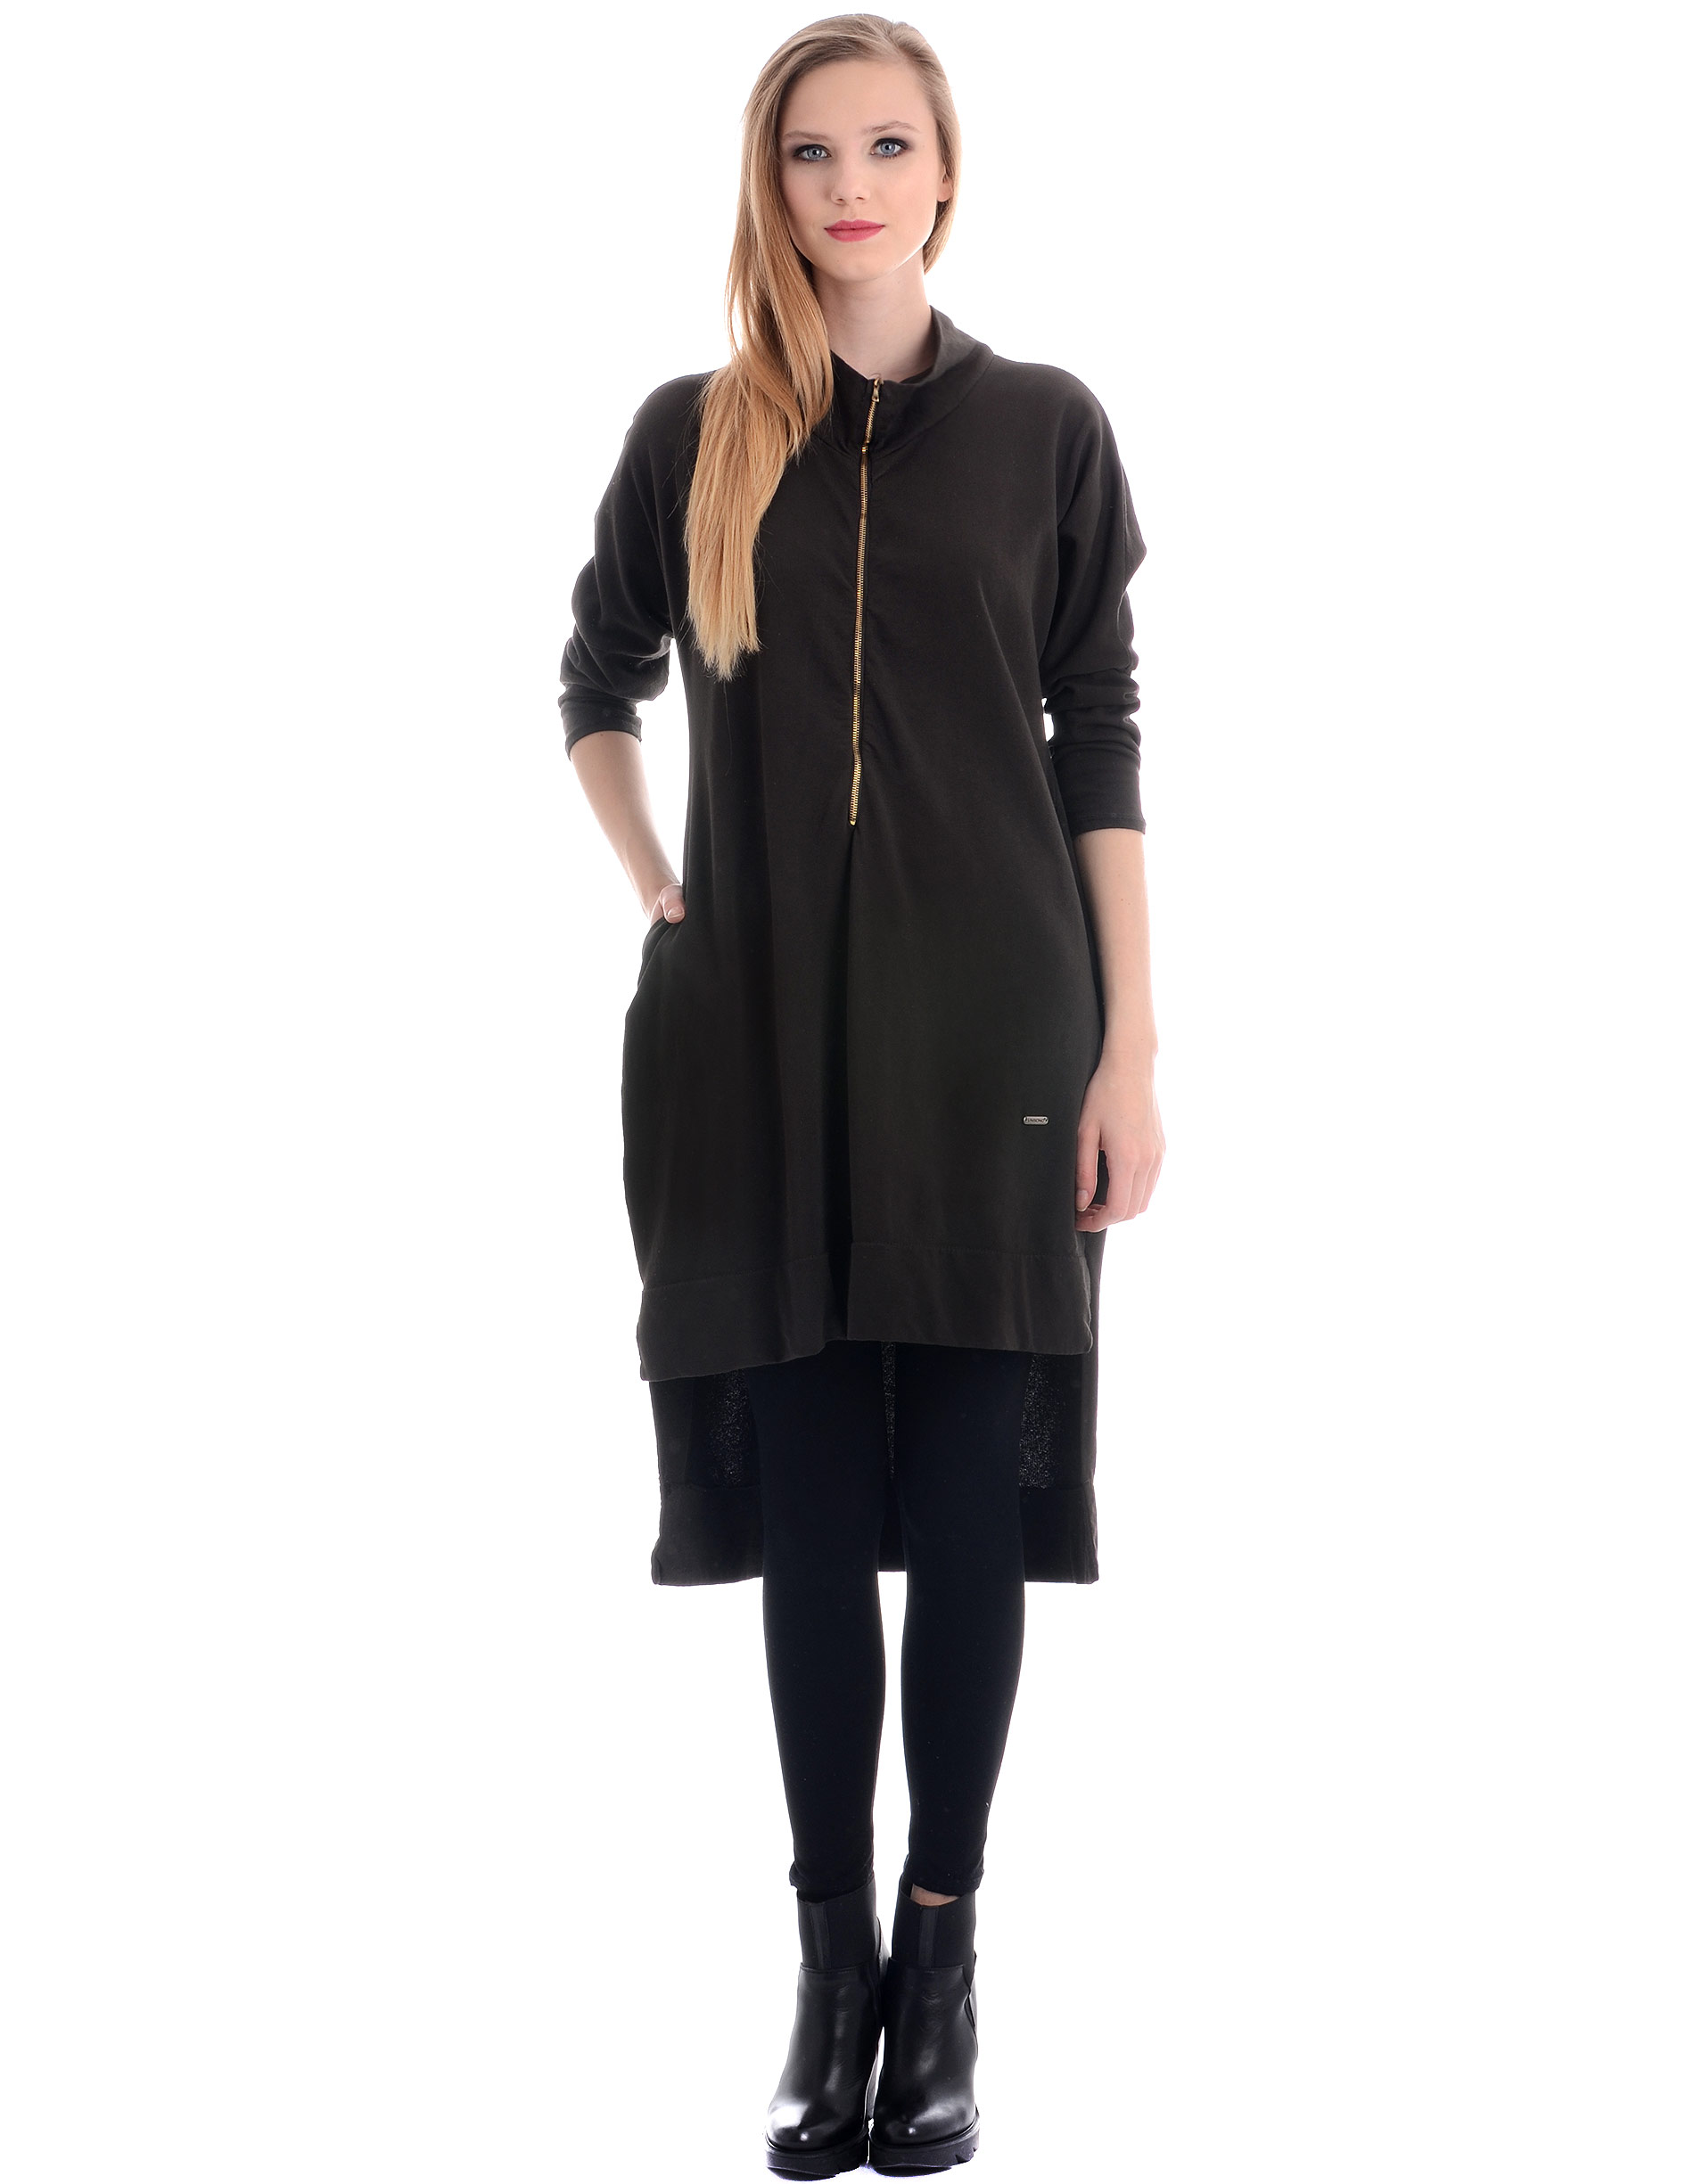 Sukienka - 34-I1080 MORO - Unisono